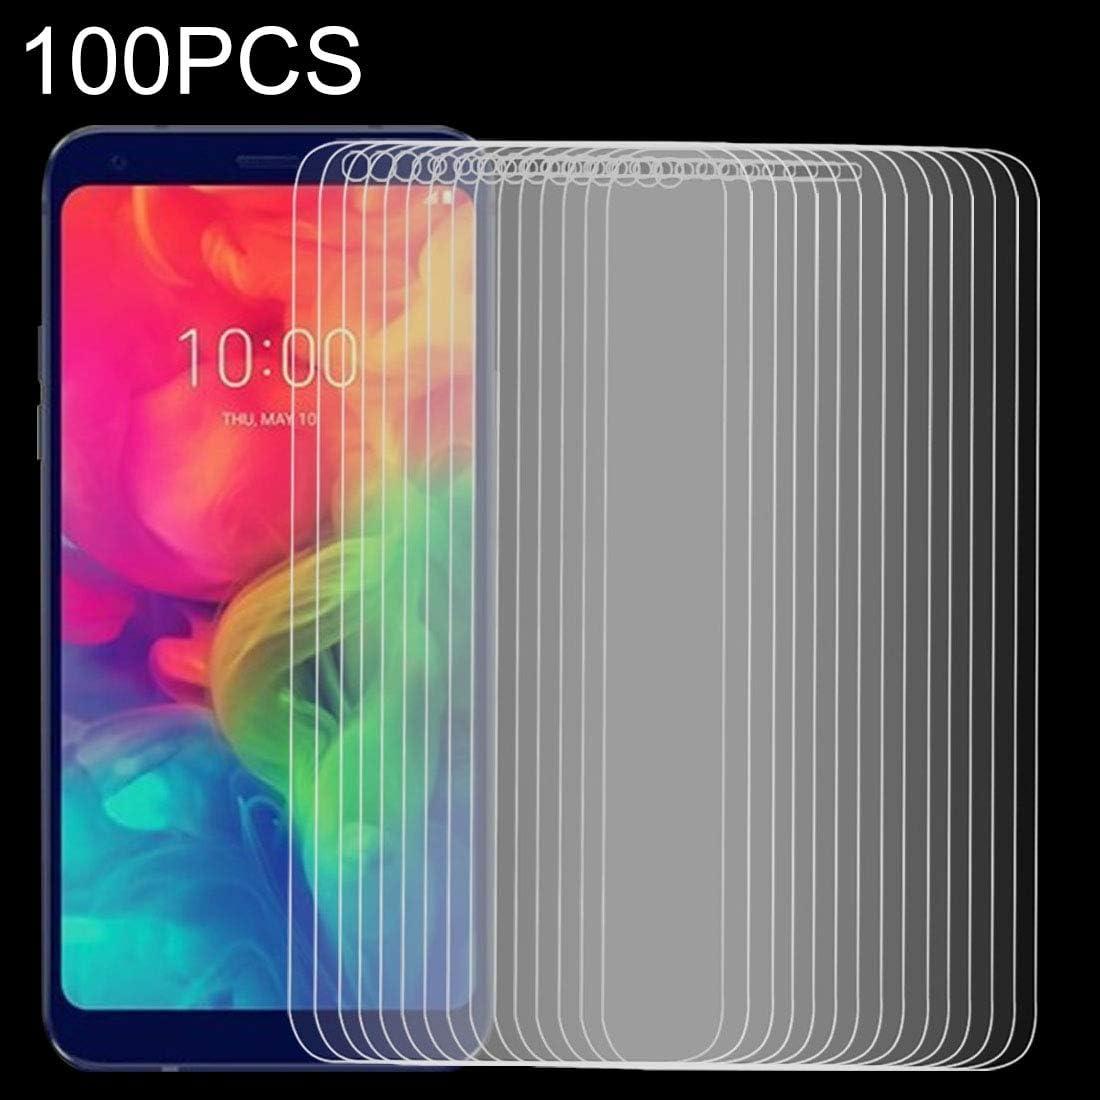 GUOSHU Premium Tempered Glass Screen Film 100 PCS 9H 2.5D Tempered Glass Film for LG Q7 Anti-Scratch Screen Protector